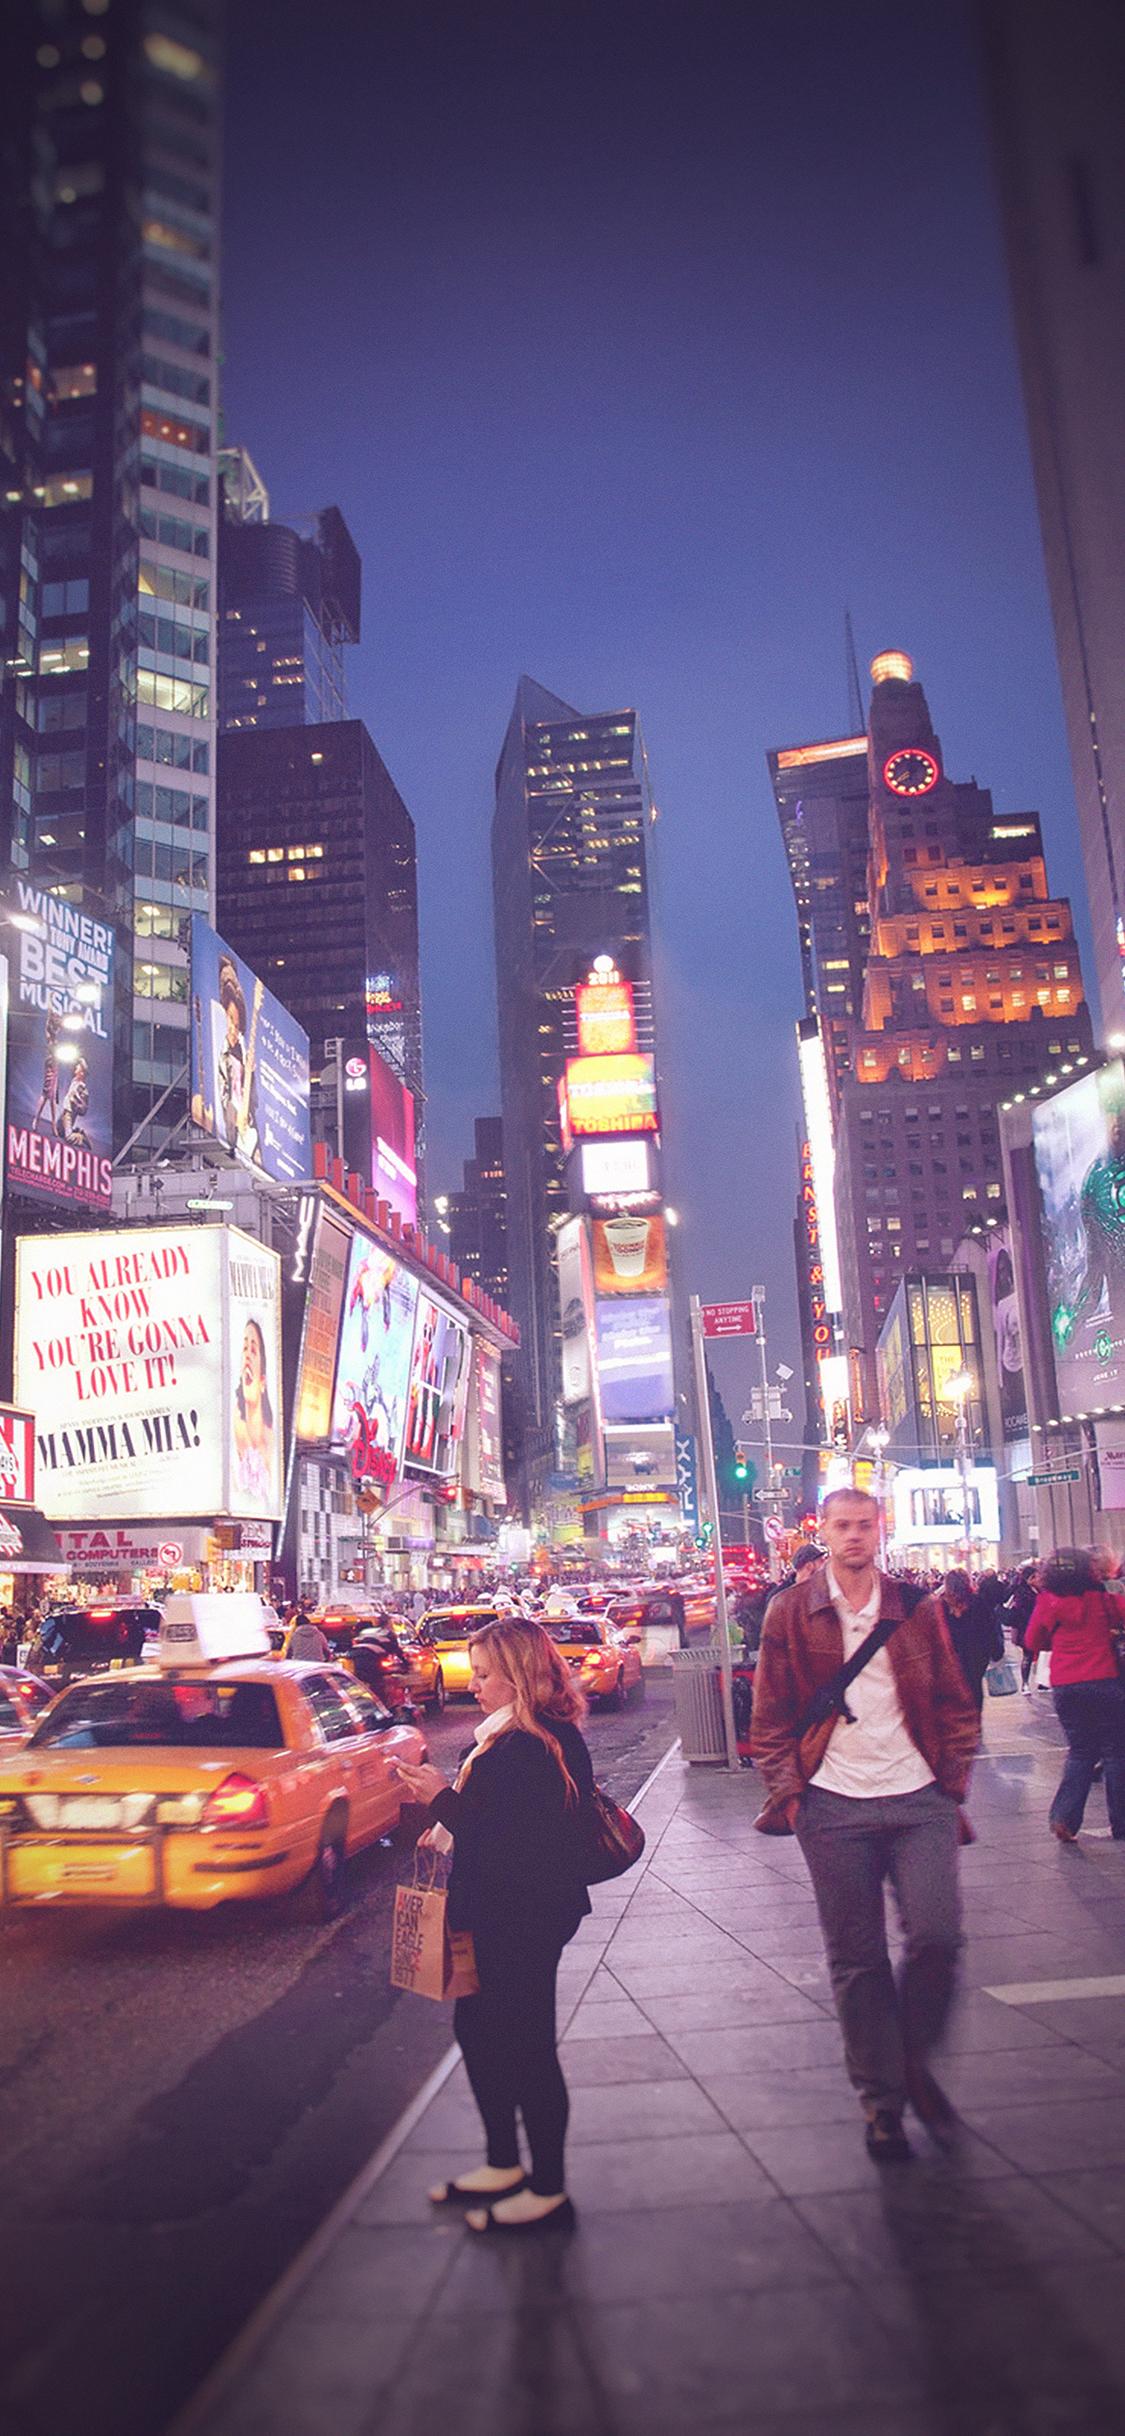 Iphonexpapers Com Iphone X Wallpaper Mn65 New York